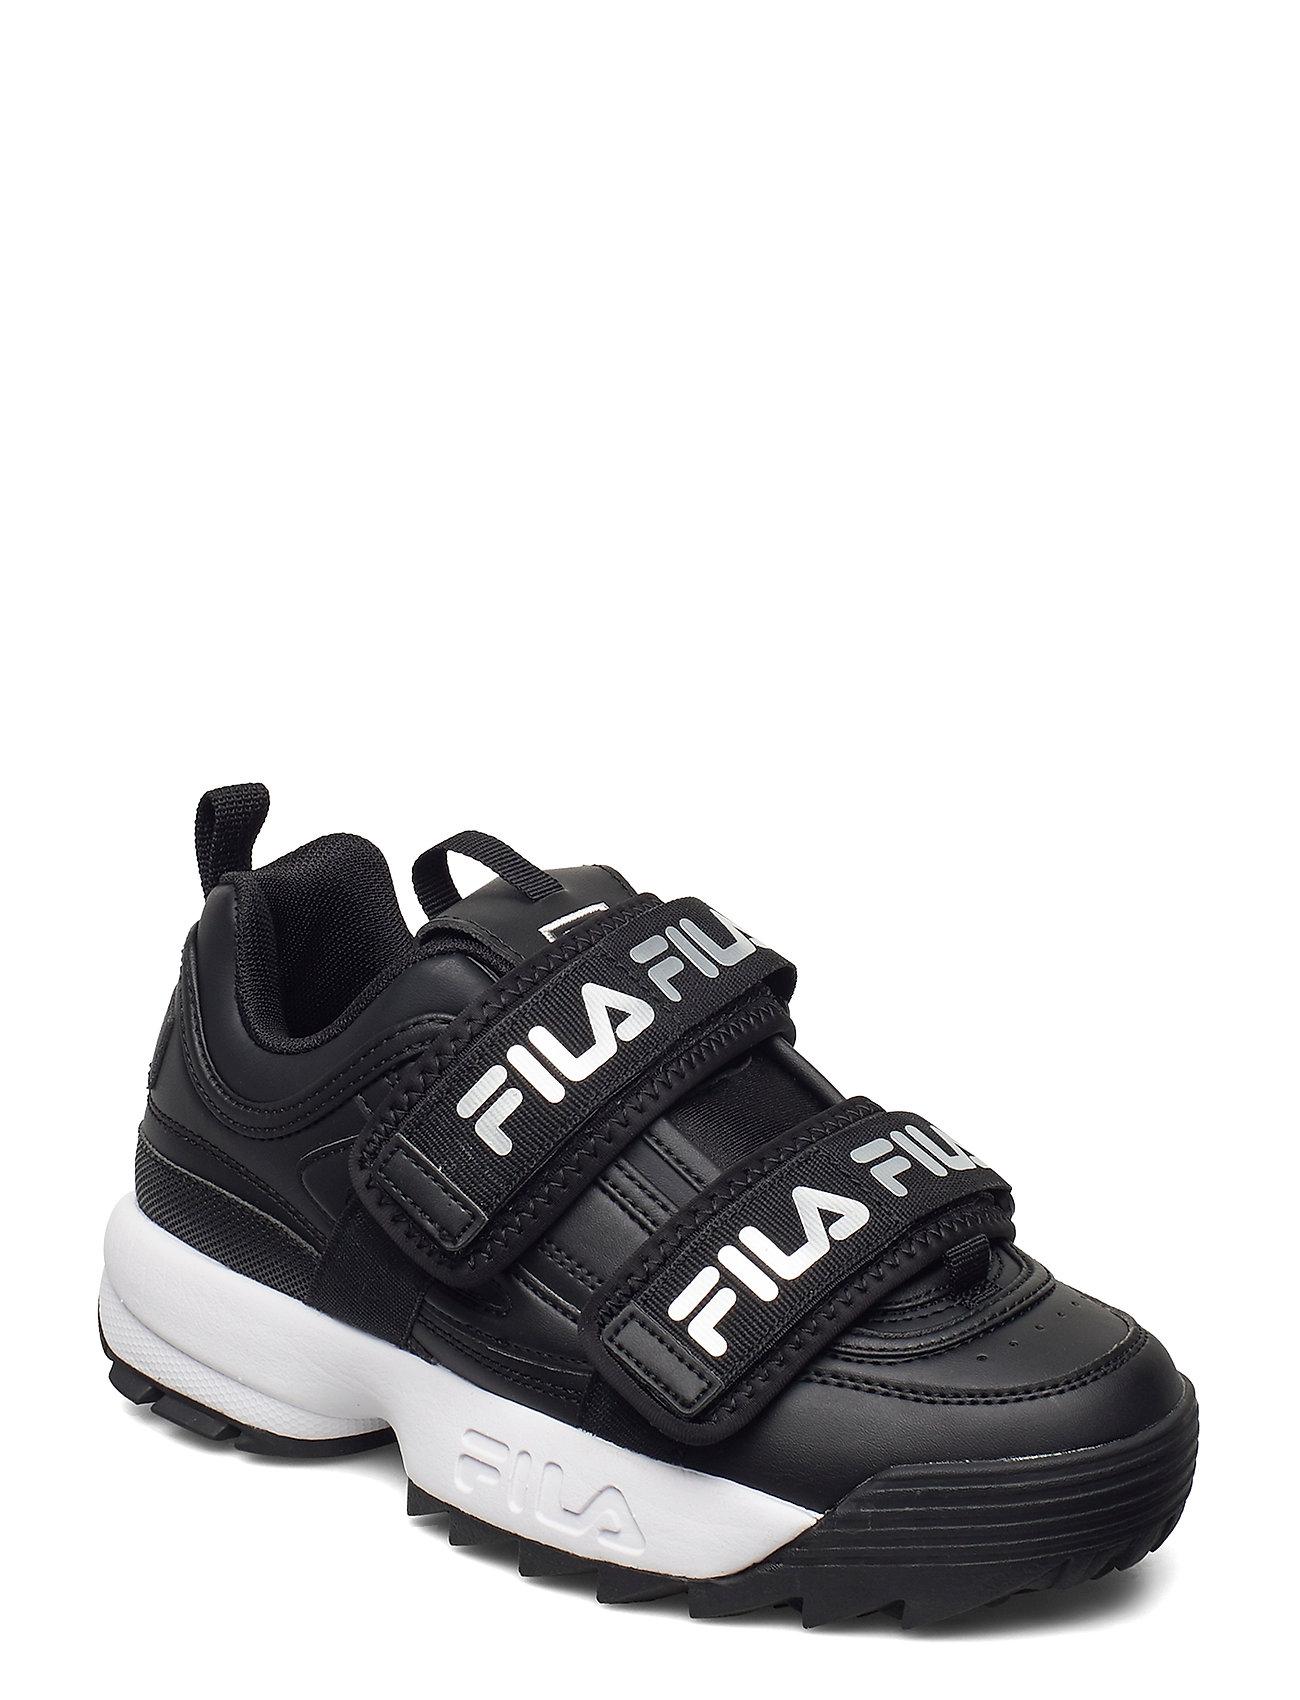 Image of Disruptor Straps Wmn Low-top Sneakers Sort FILA (3446808649)